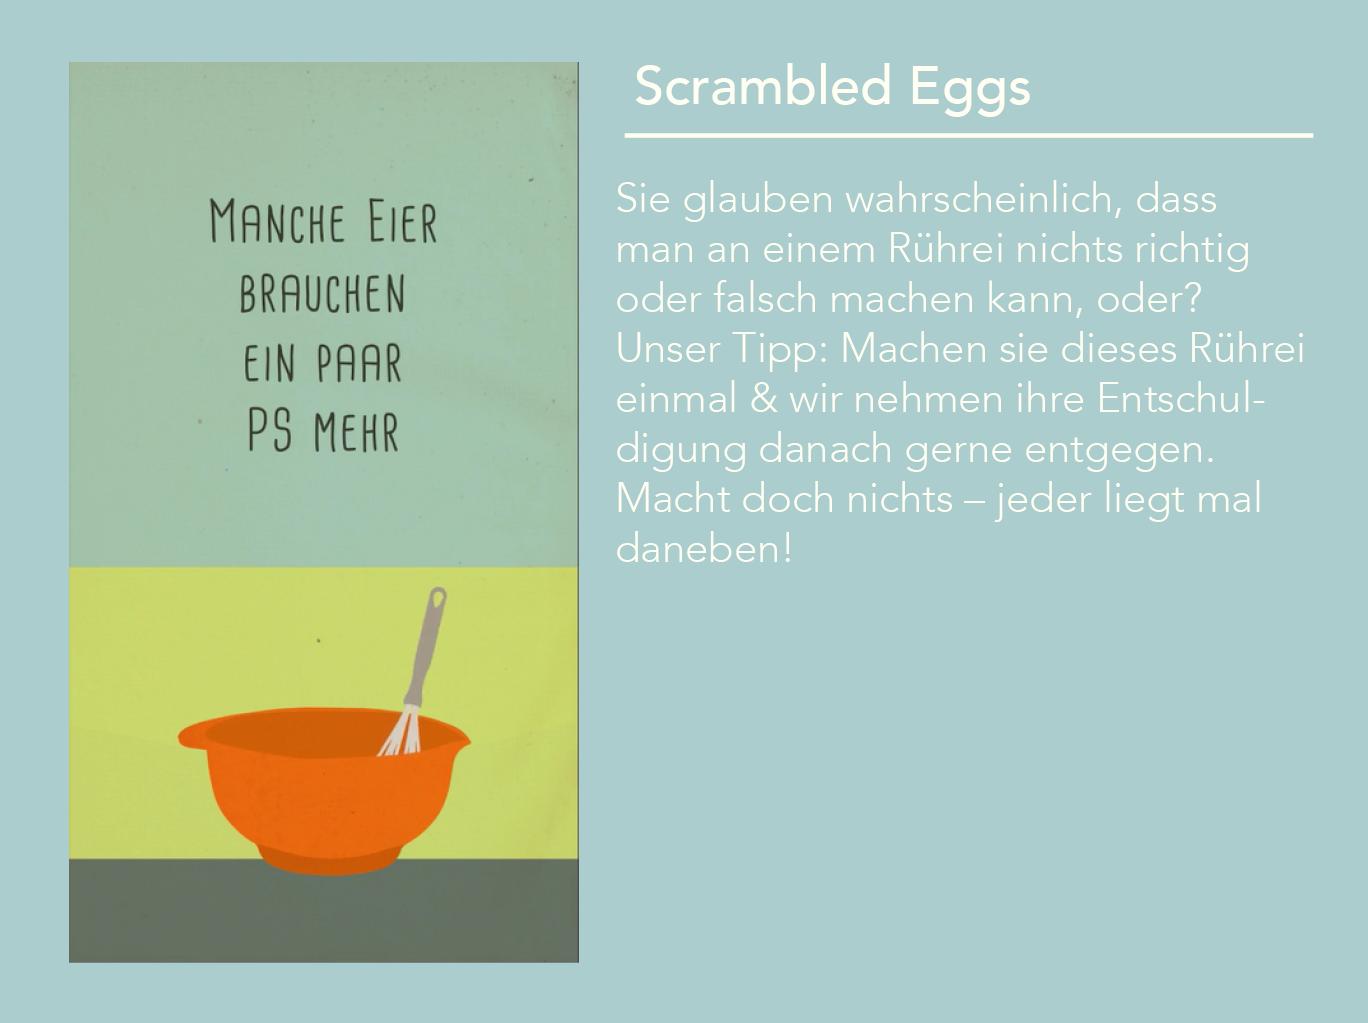 Active_Cooking_Scrambled_eggs